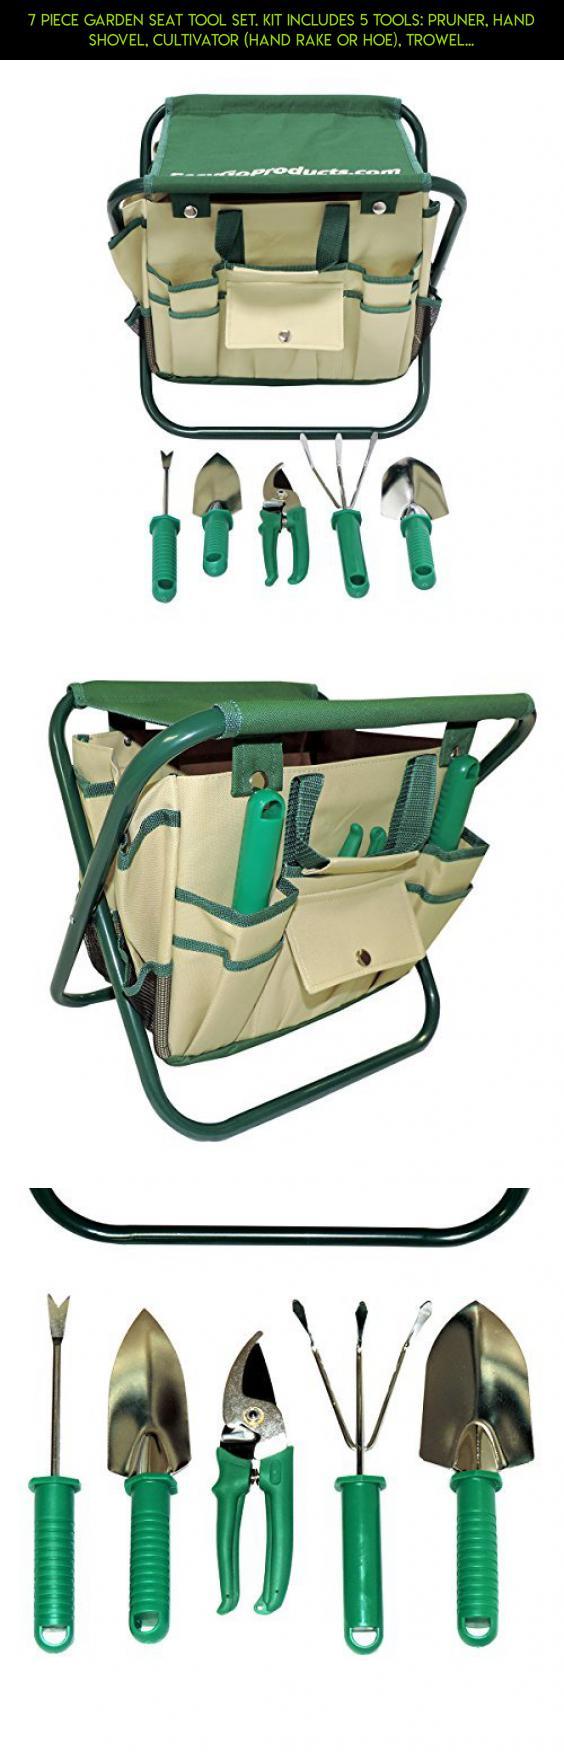 7 Piece Garden Seat Tool Set. Kit Includes 5 Tools: Pruner, Hand Shovel